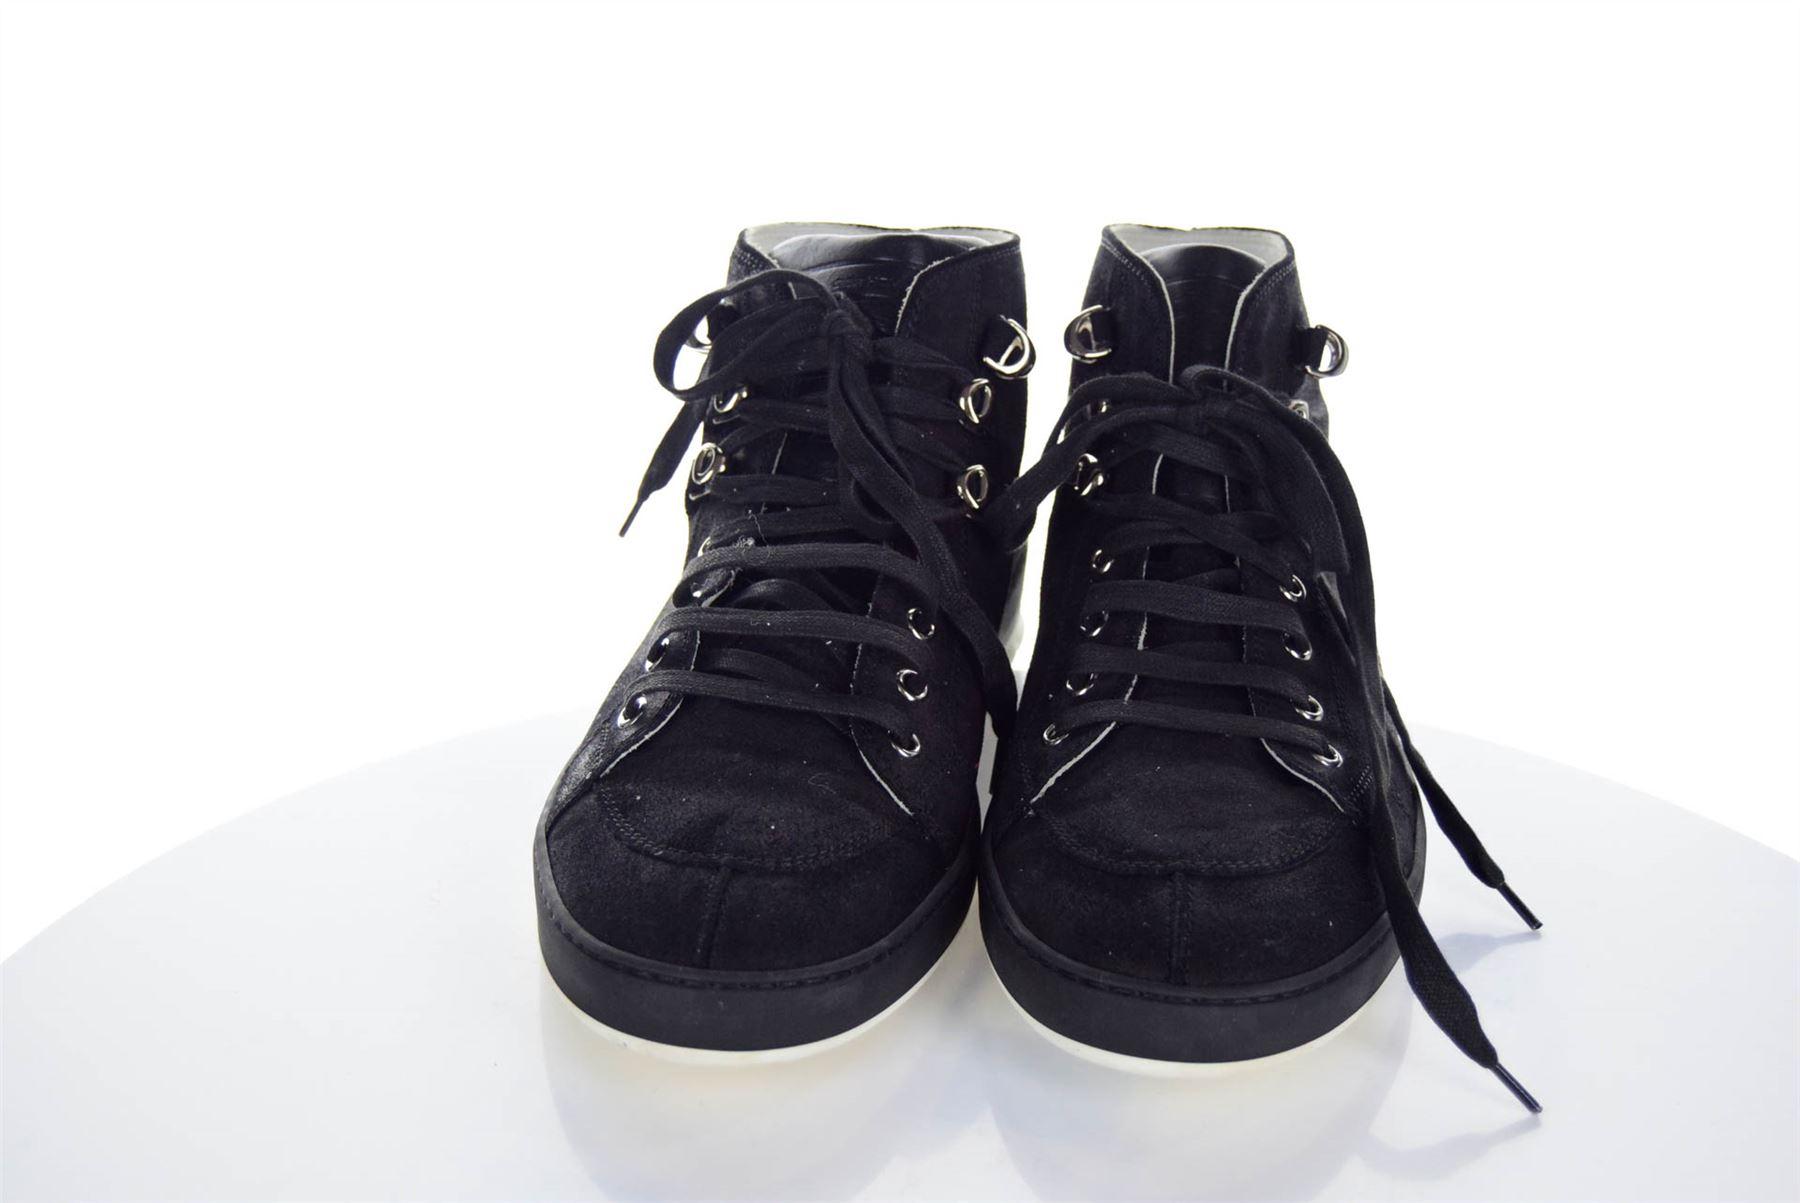 d806ac13e26d6 DIOR HOMME Black High-Top Sneakers, UK 9 US 9.5 EU 43   eBay